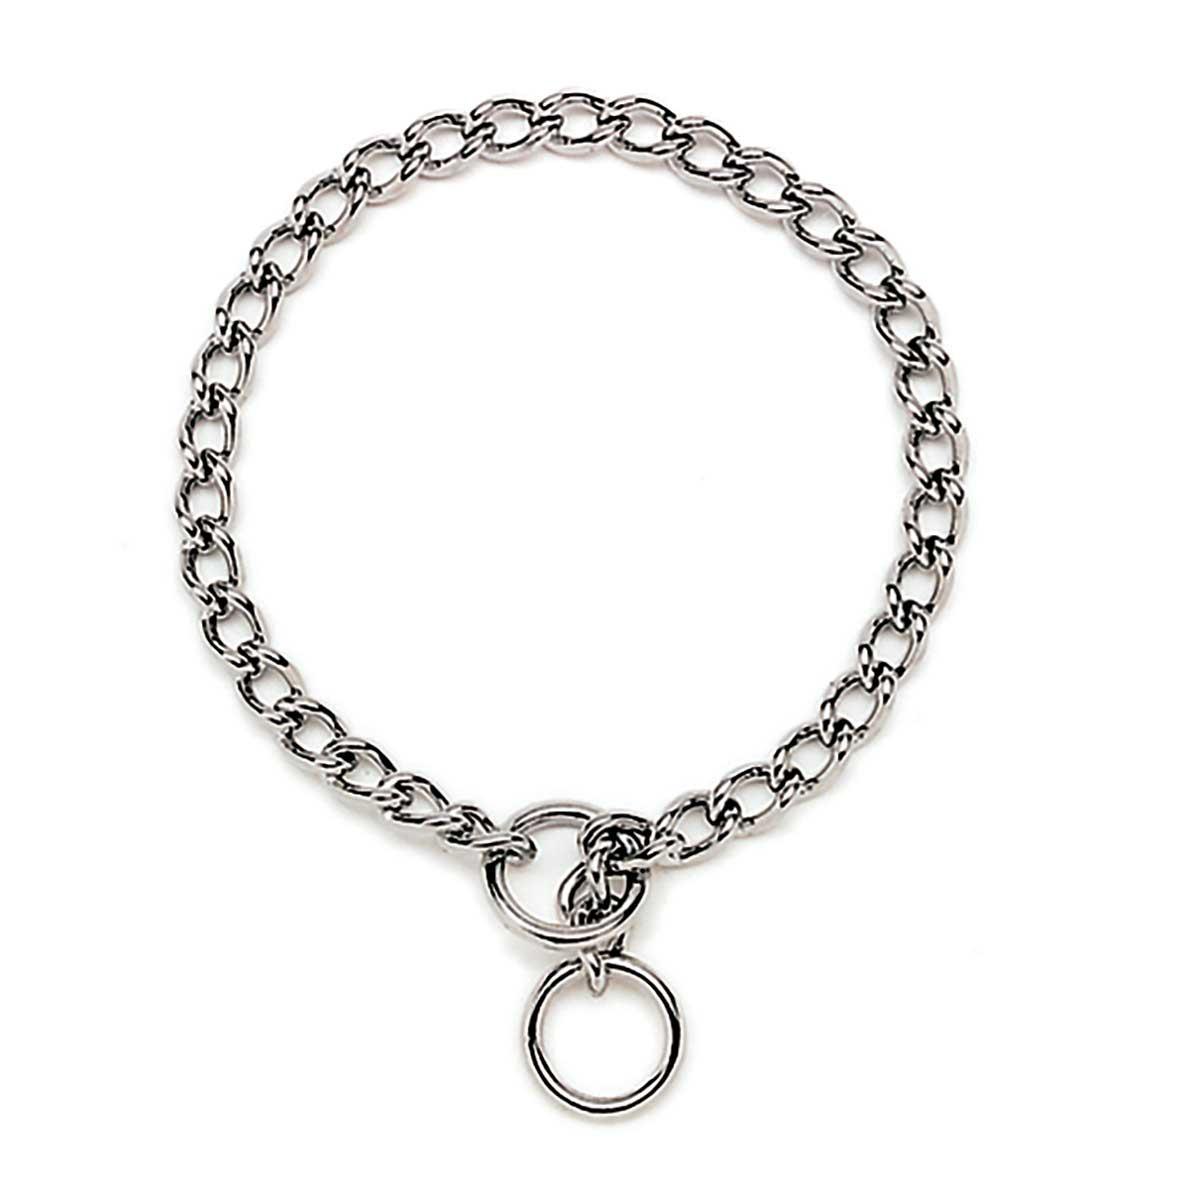 Coastal Medium Choke Chains for Dog Training - 2.5mm